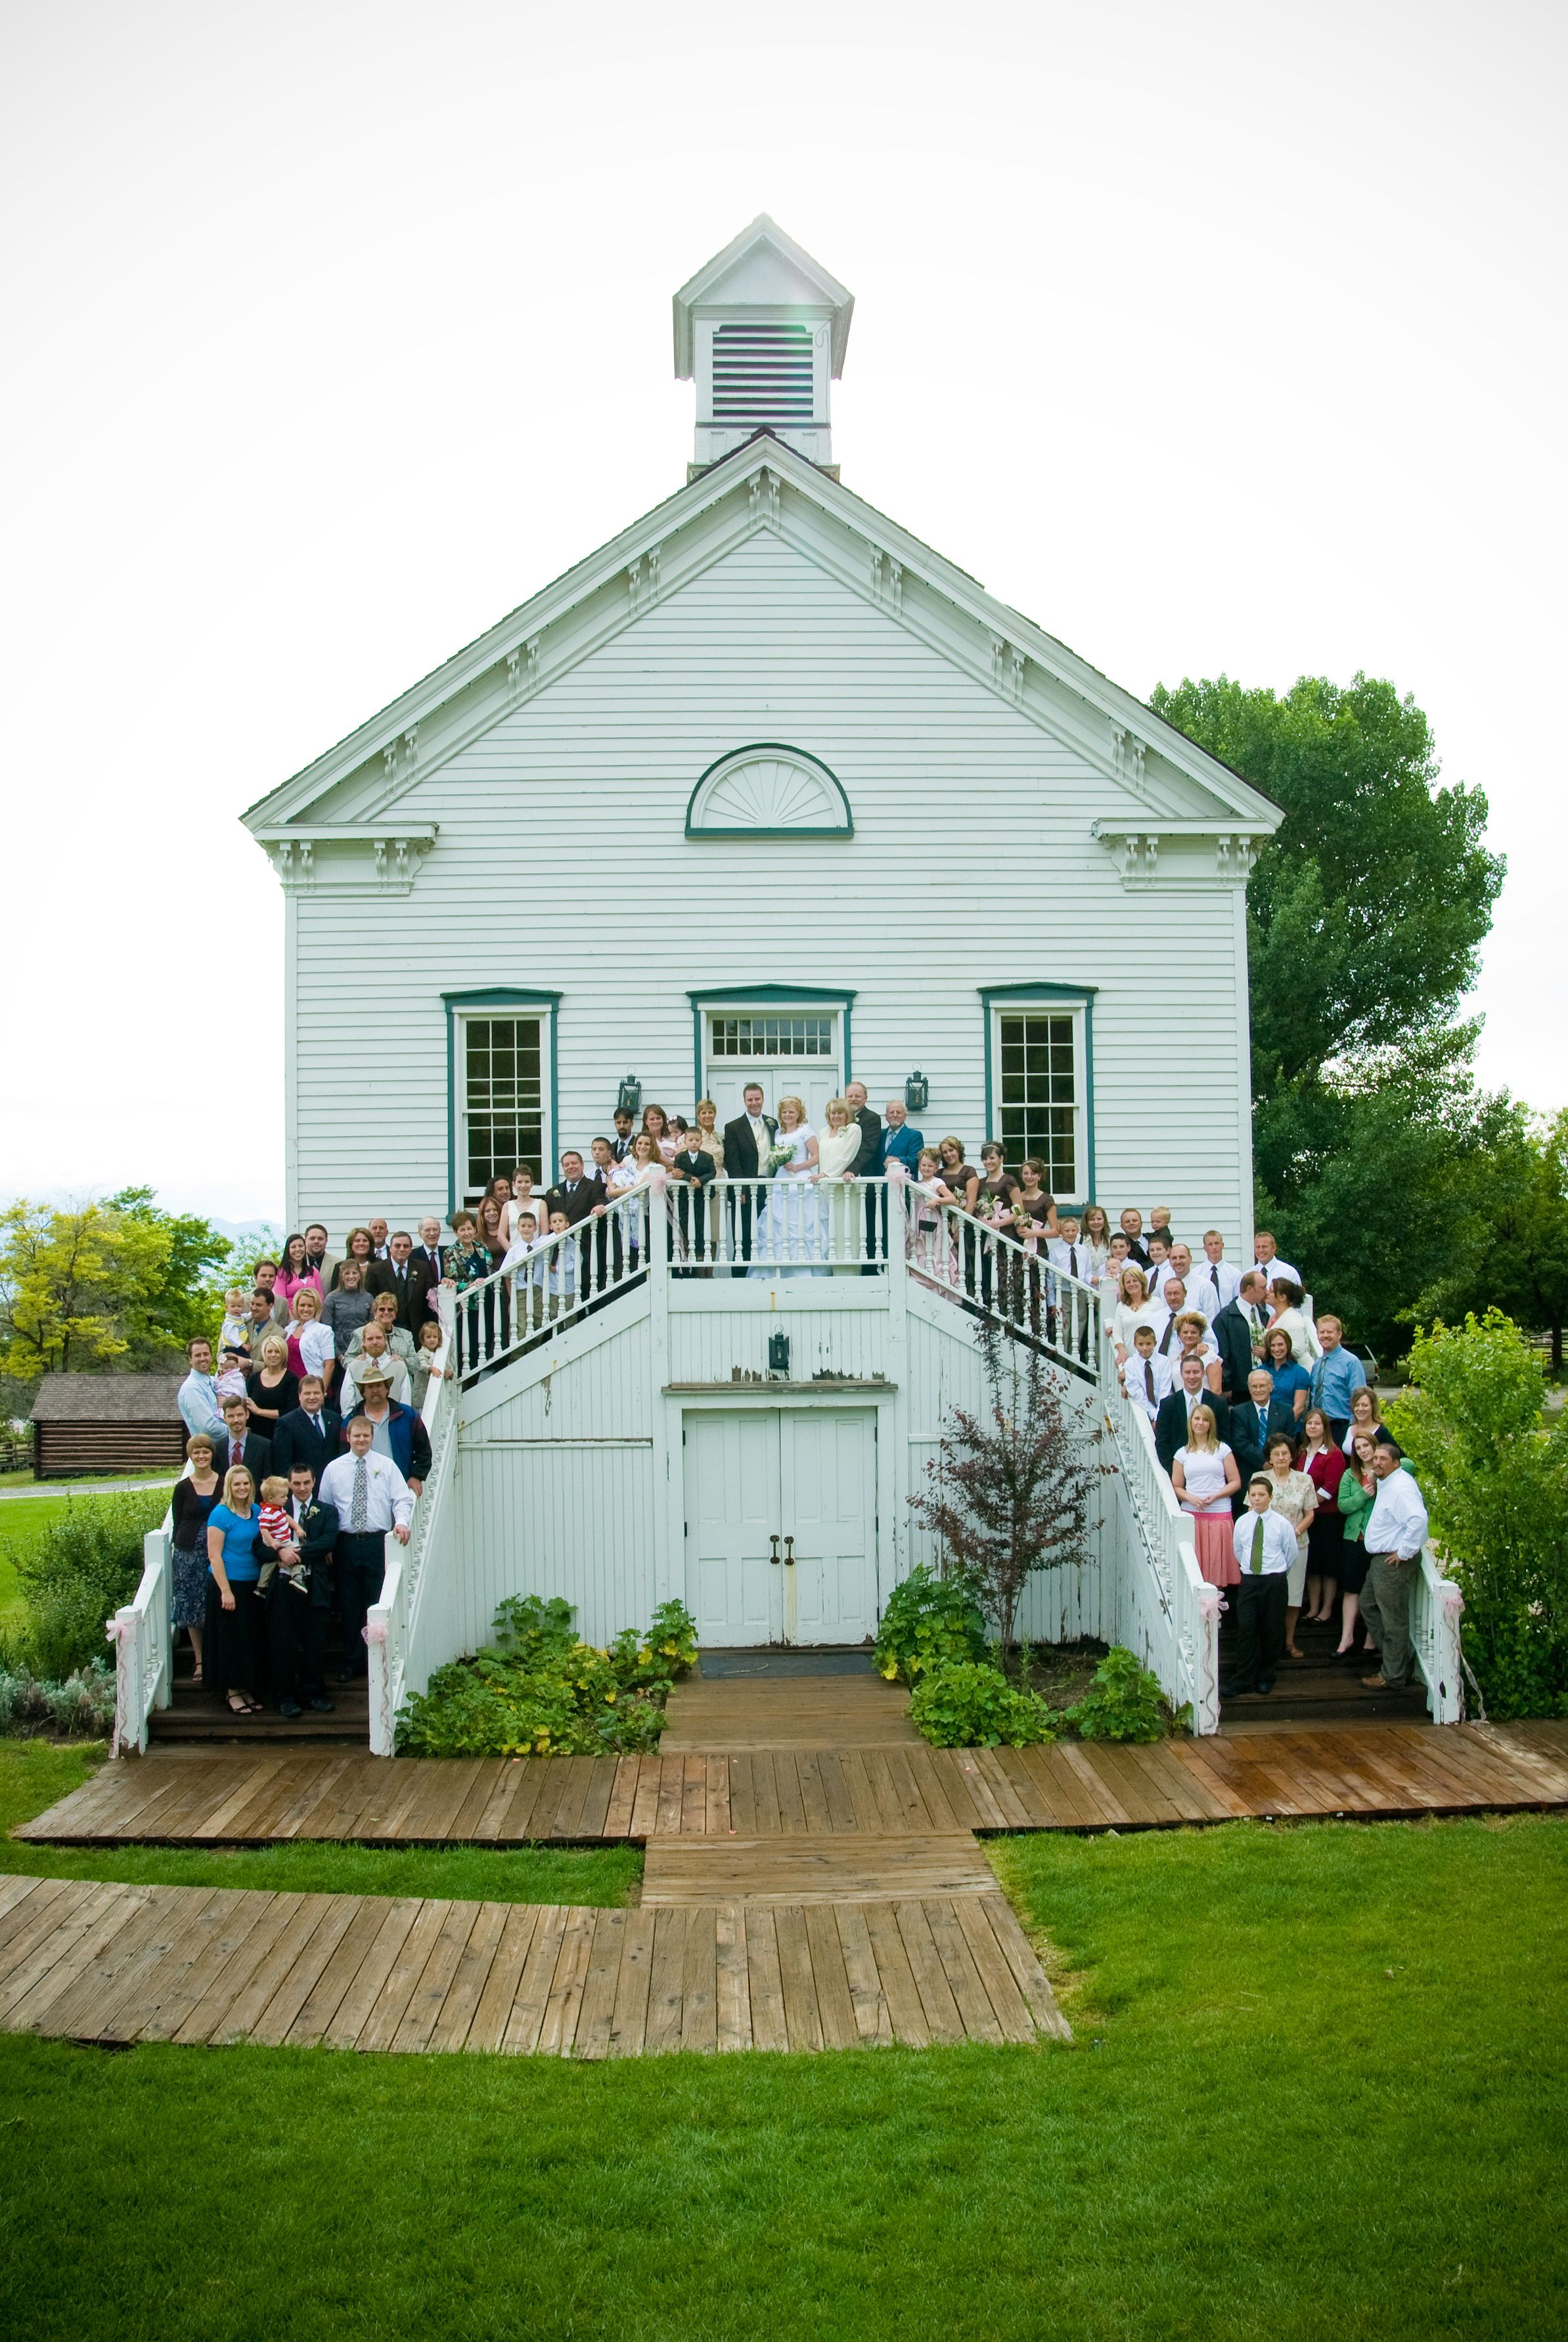 Pine Valley Chapel Wedding Weddings At This Is The Place Heritage Park 8019247507 Utahweddingvenue Thisistheplace Wedding Venues Utah Chapel Wedding Chapel